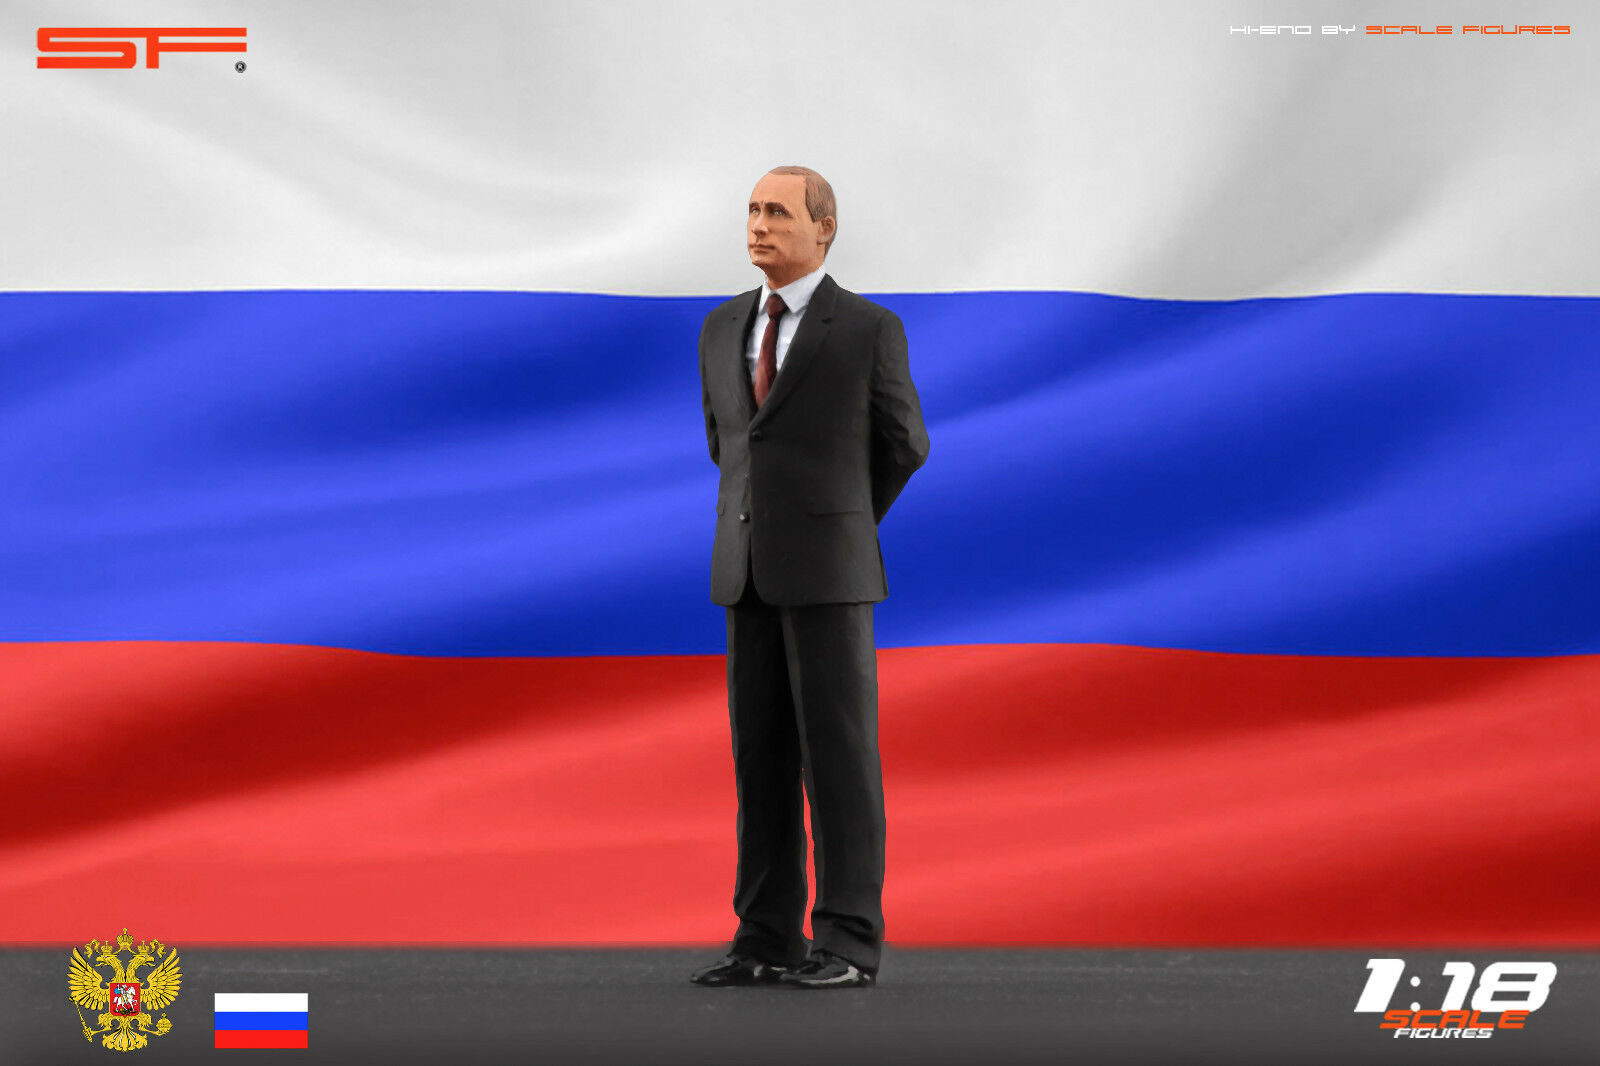 1:18 Vladimir Putin VERY RARE!!! figurine NO CARS !! for diecast collectors